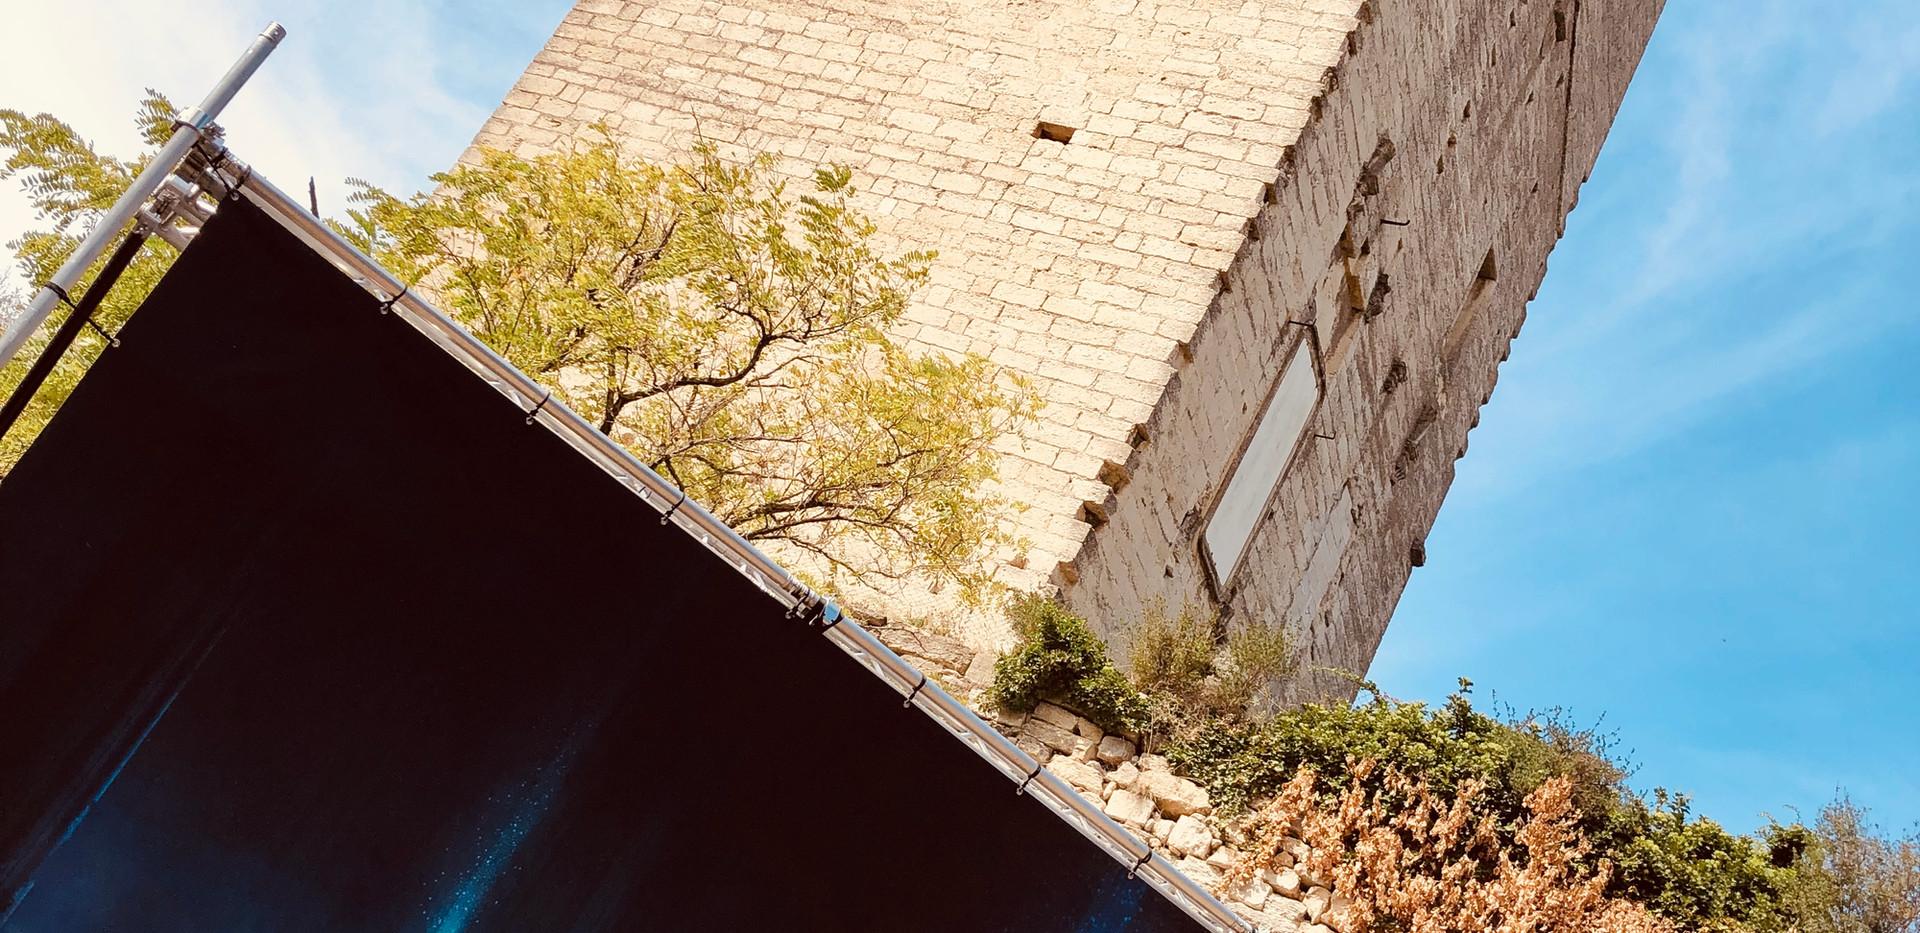 Inauguration de la Tour de Barbentane